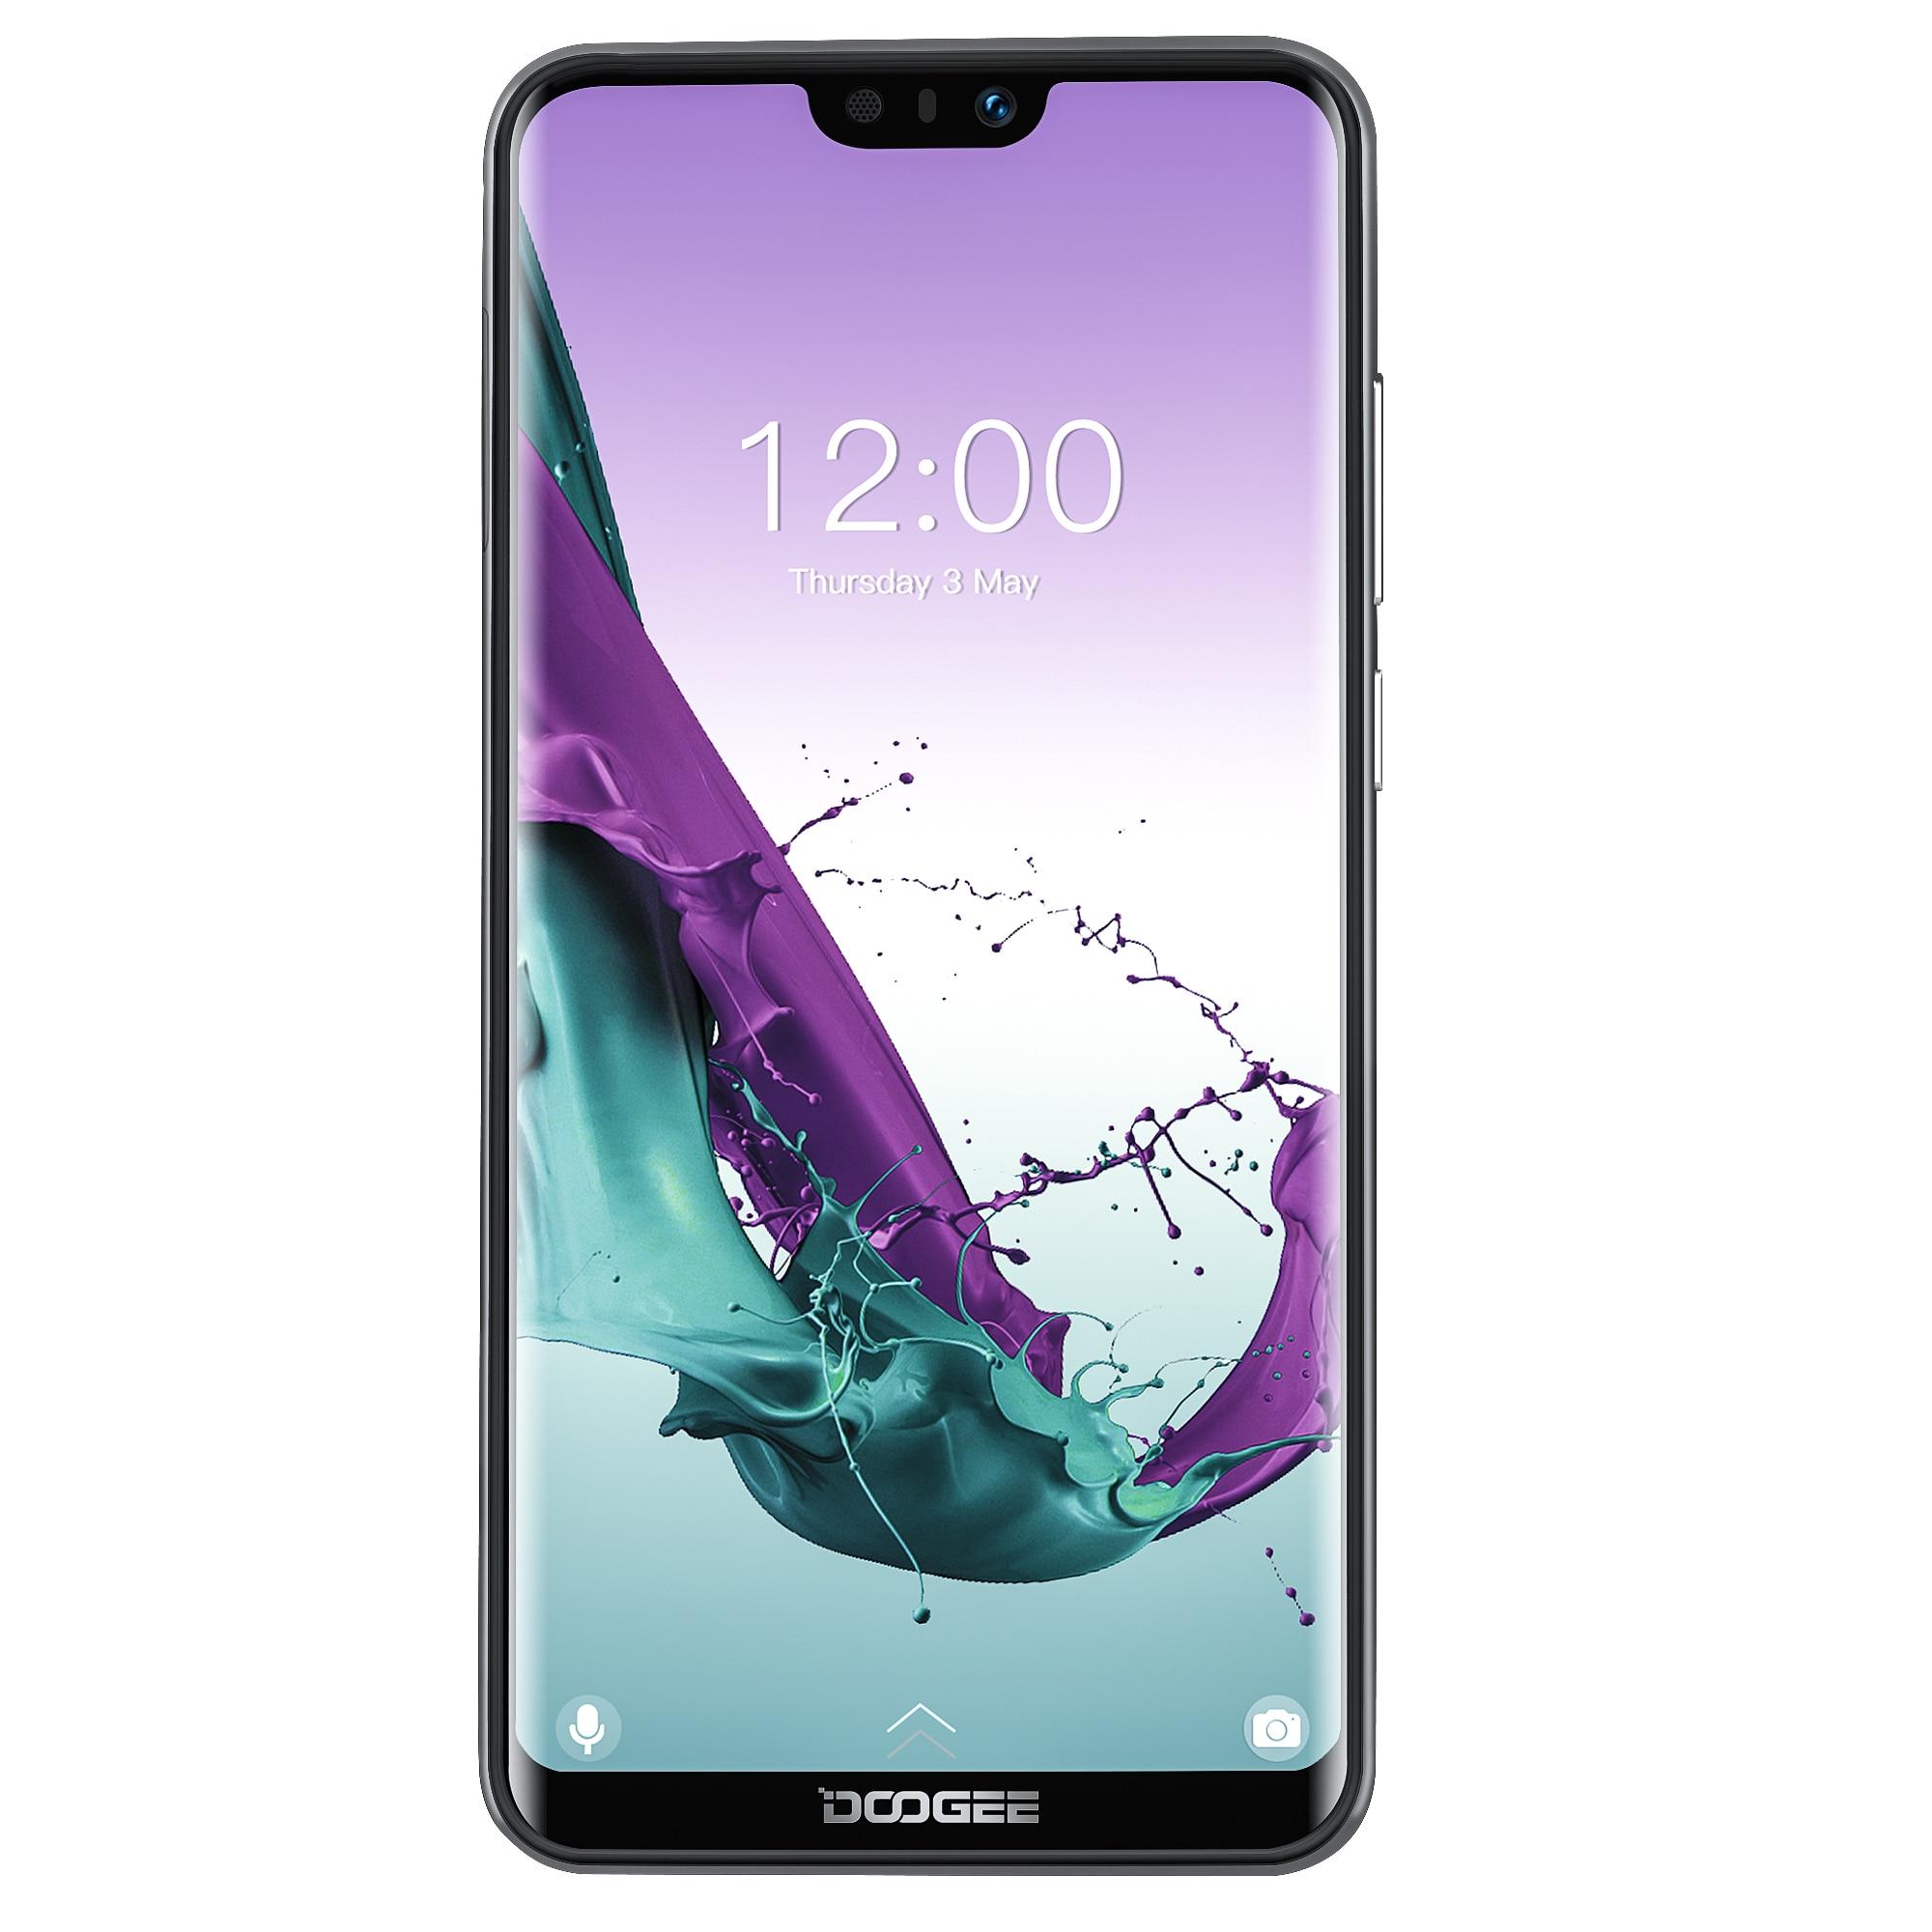 DOOGEE N10 2019 Android 8.14G LTE Mobiele Telefoon 5.84inch Octa Core 3GB RAM 32GB ROM FHD 19:9 Display 16.0MP Front Camera 3360mAh-in Mobiele Telefoons van Mobiele telefoons & telecommunicatie op AliExpress - 11.11_Dubbel 11Vrijgezellendag 1